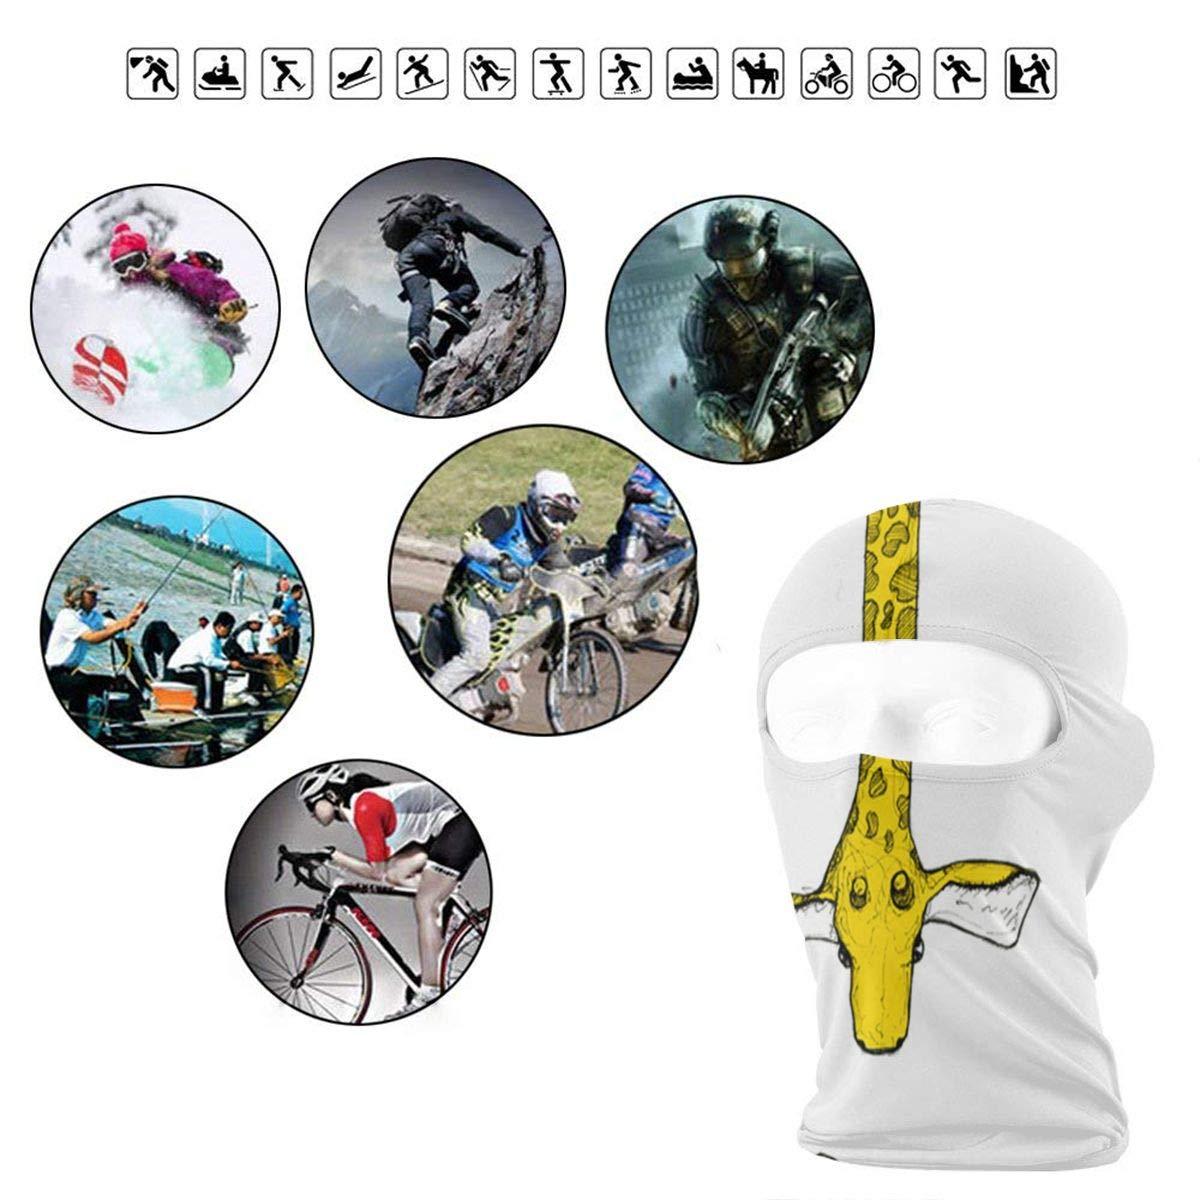 Balaclava Girl Holding A Basket Full Face Masks Ski Sports Cap Motorcycle Hood For Cycling Sports Snowboard